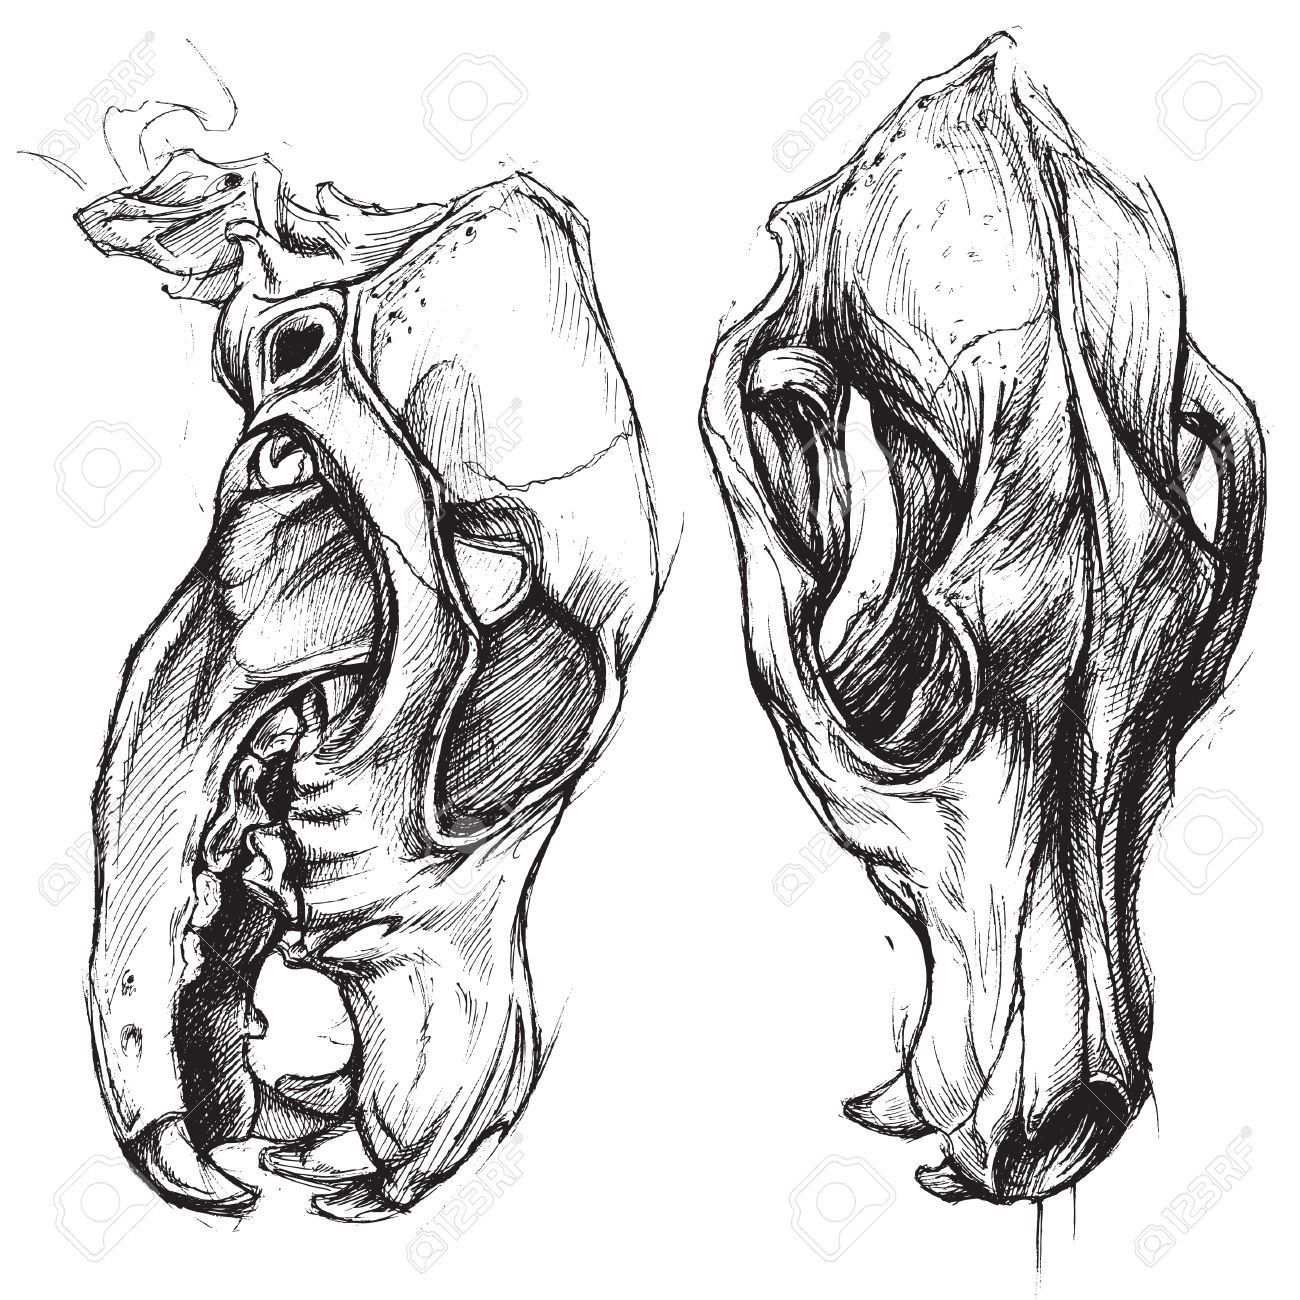 dog skull tattoo - Google Search   Tattoos   Dog skull, Dog